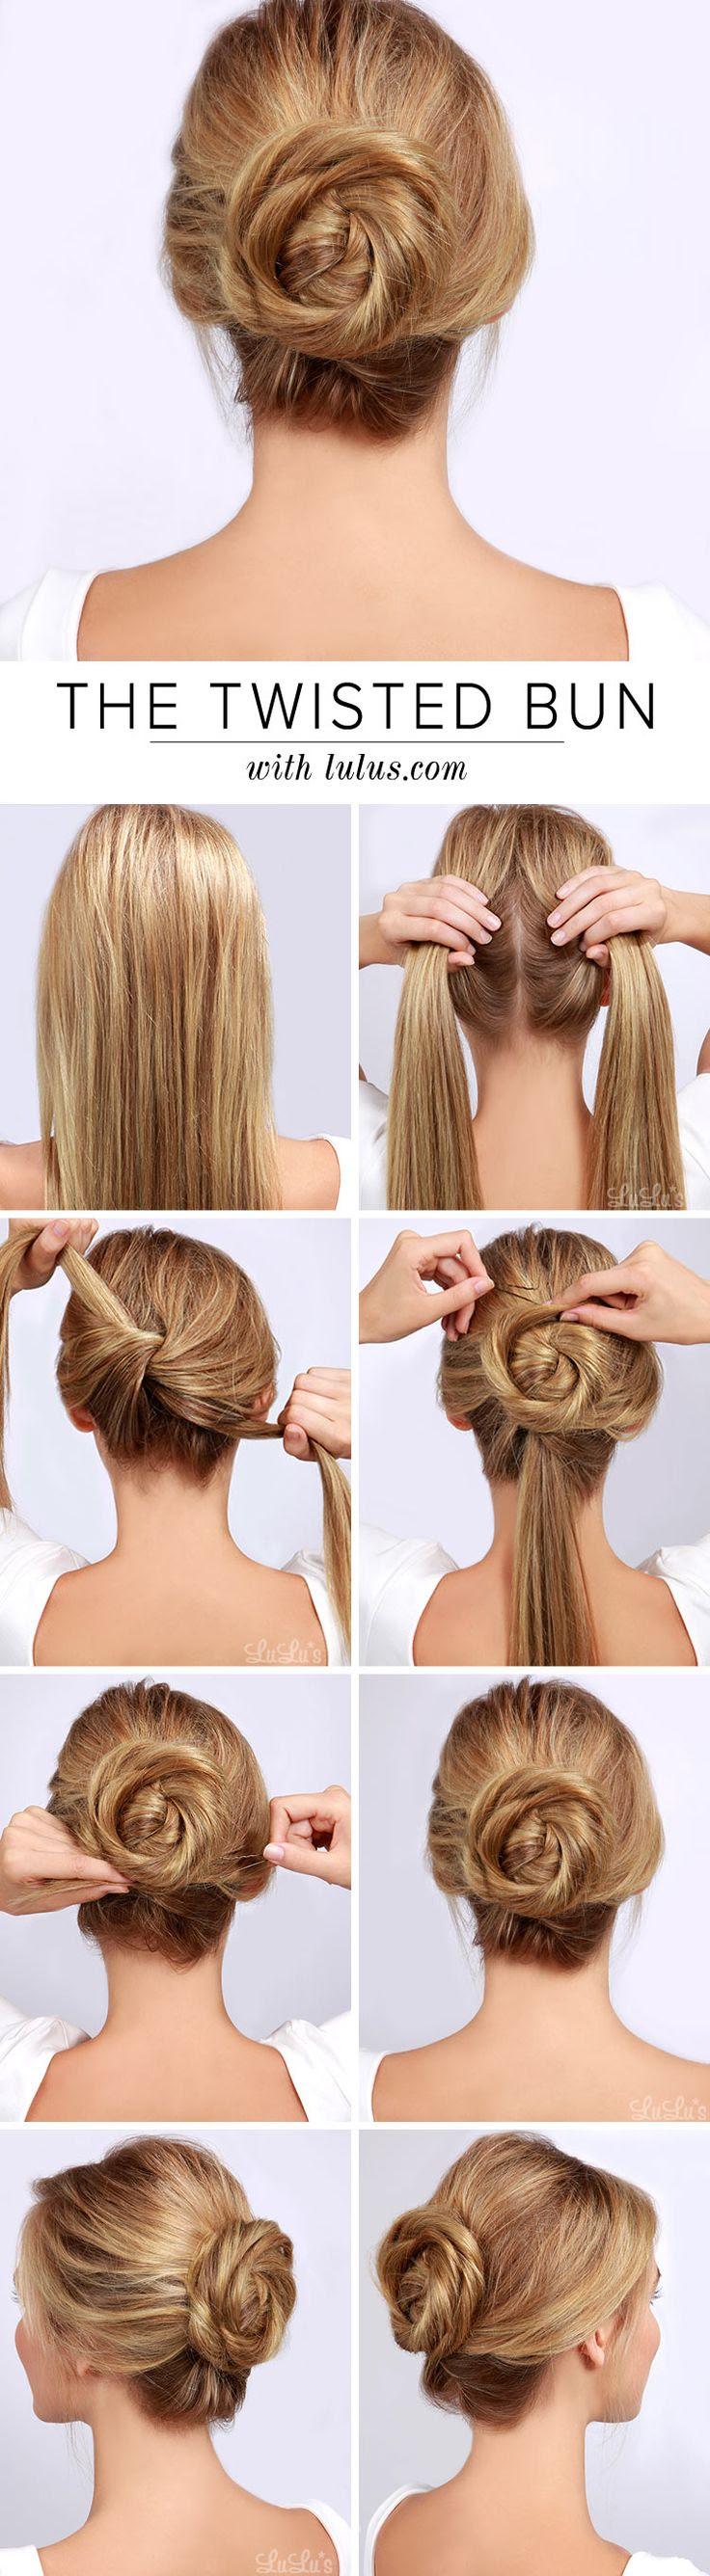 LuLu*s How-To: Twisted Bun Hair Tutorial - Lulus.com Fashion Blog